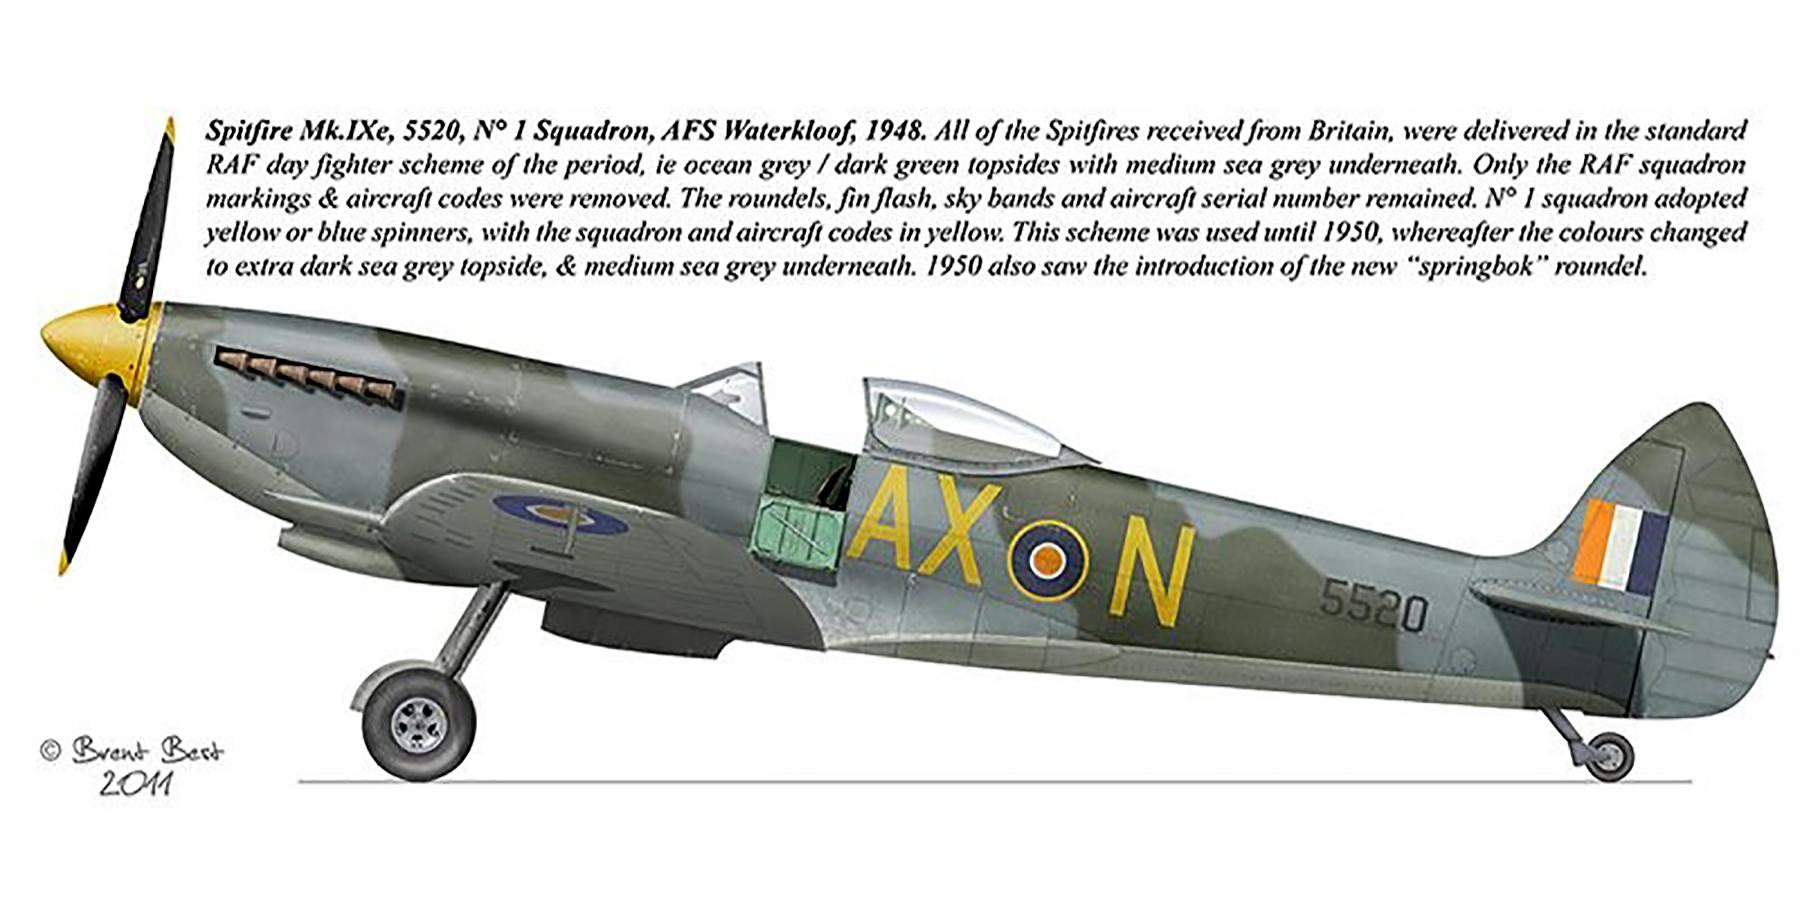 Spitfire HFIXe SAAF 1Sqn AXN 5520 Waterkloof 1948 0A